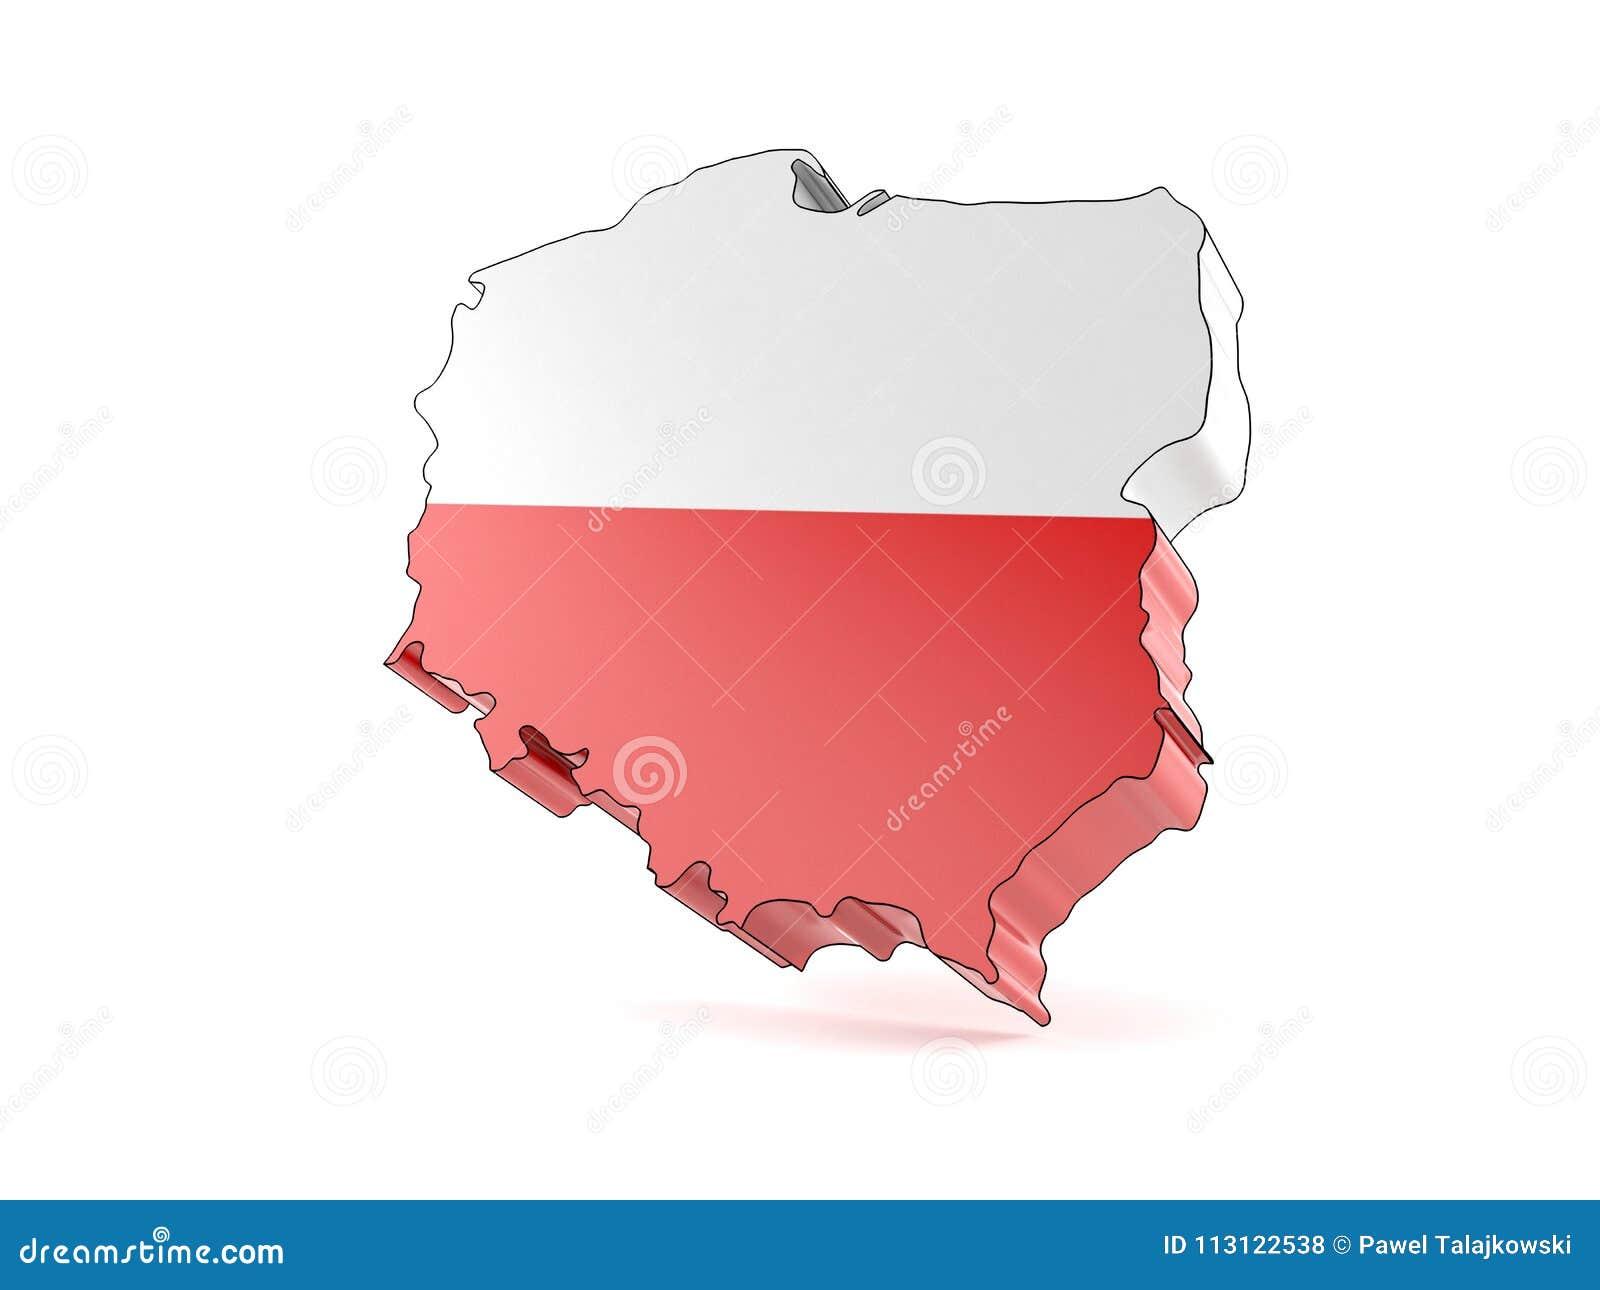 Poland country